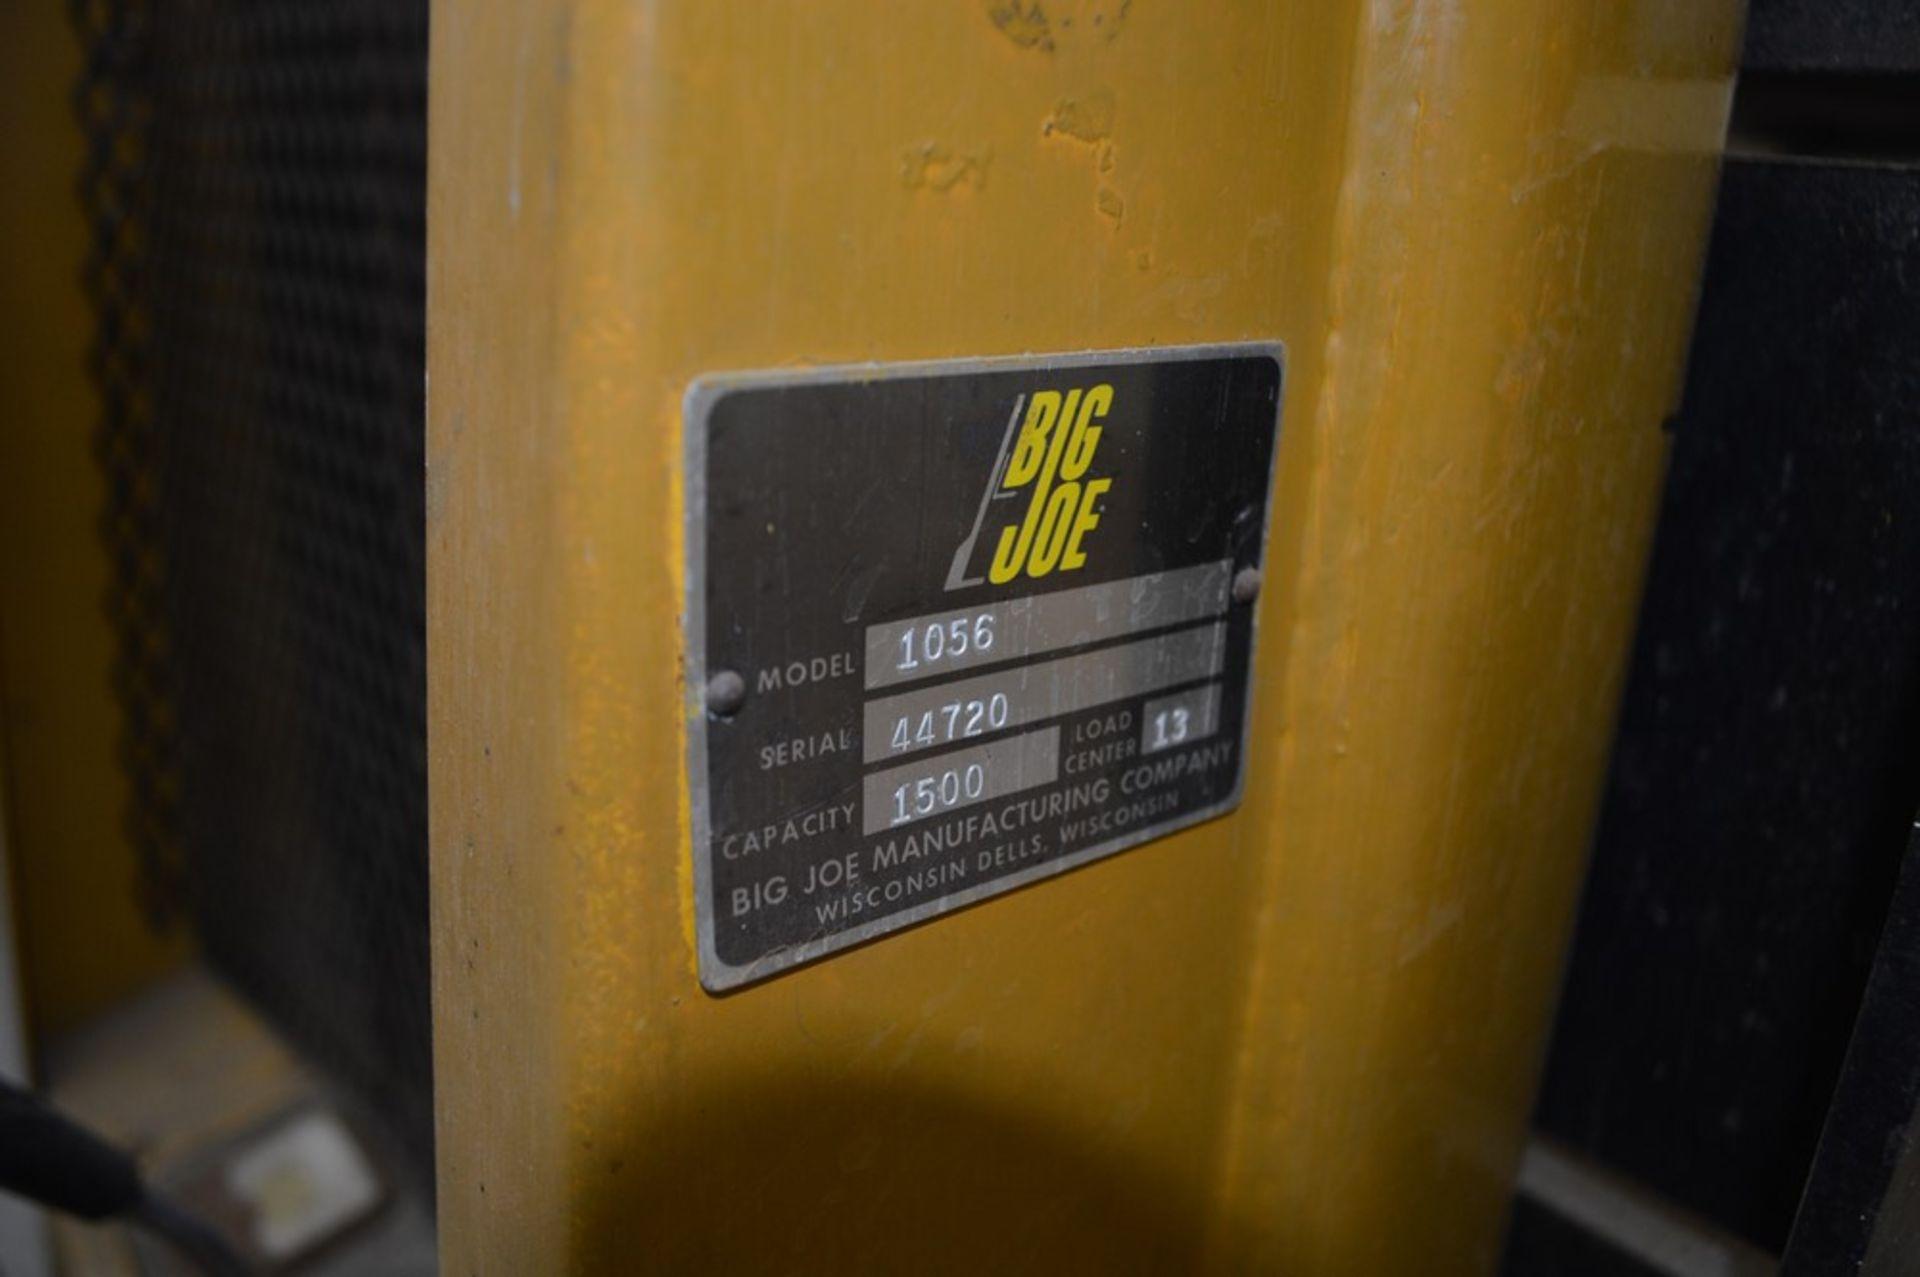 Toyota Lift Big Joe Lift, battery with internal charger - Image 7 of 7